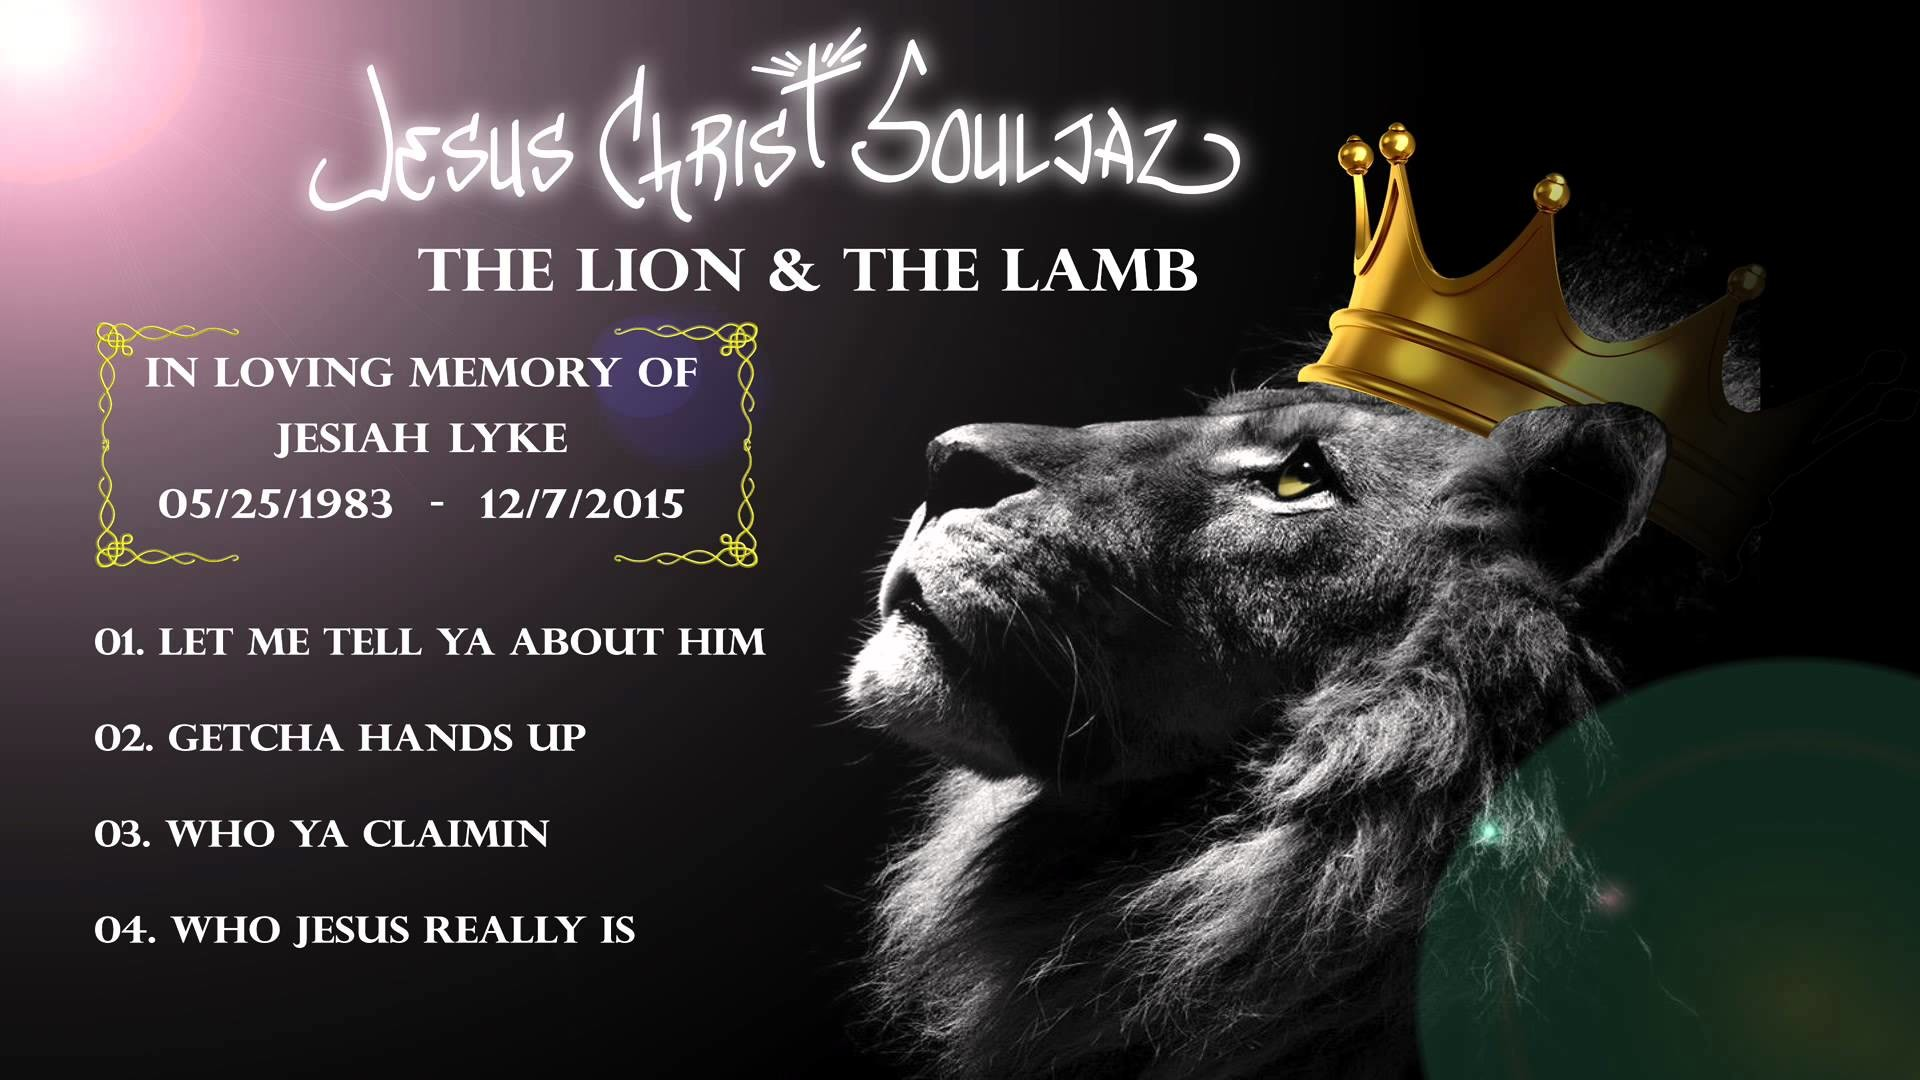 Jesus Christ Soldiers, The Lion & The Lamb